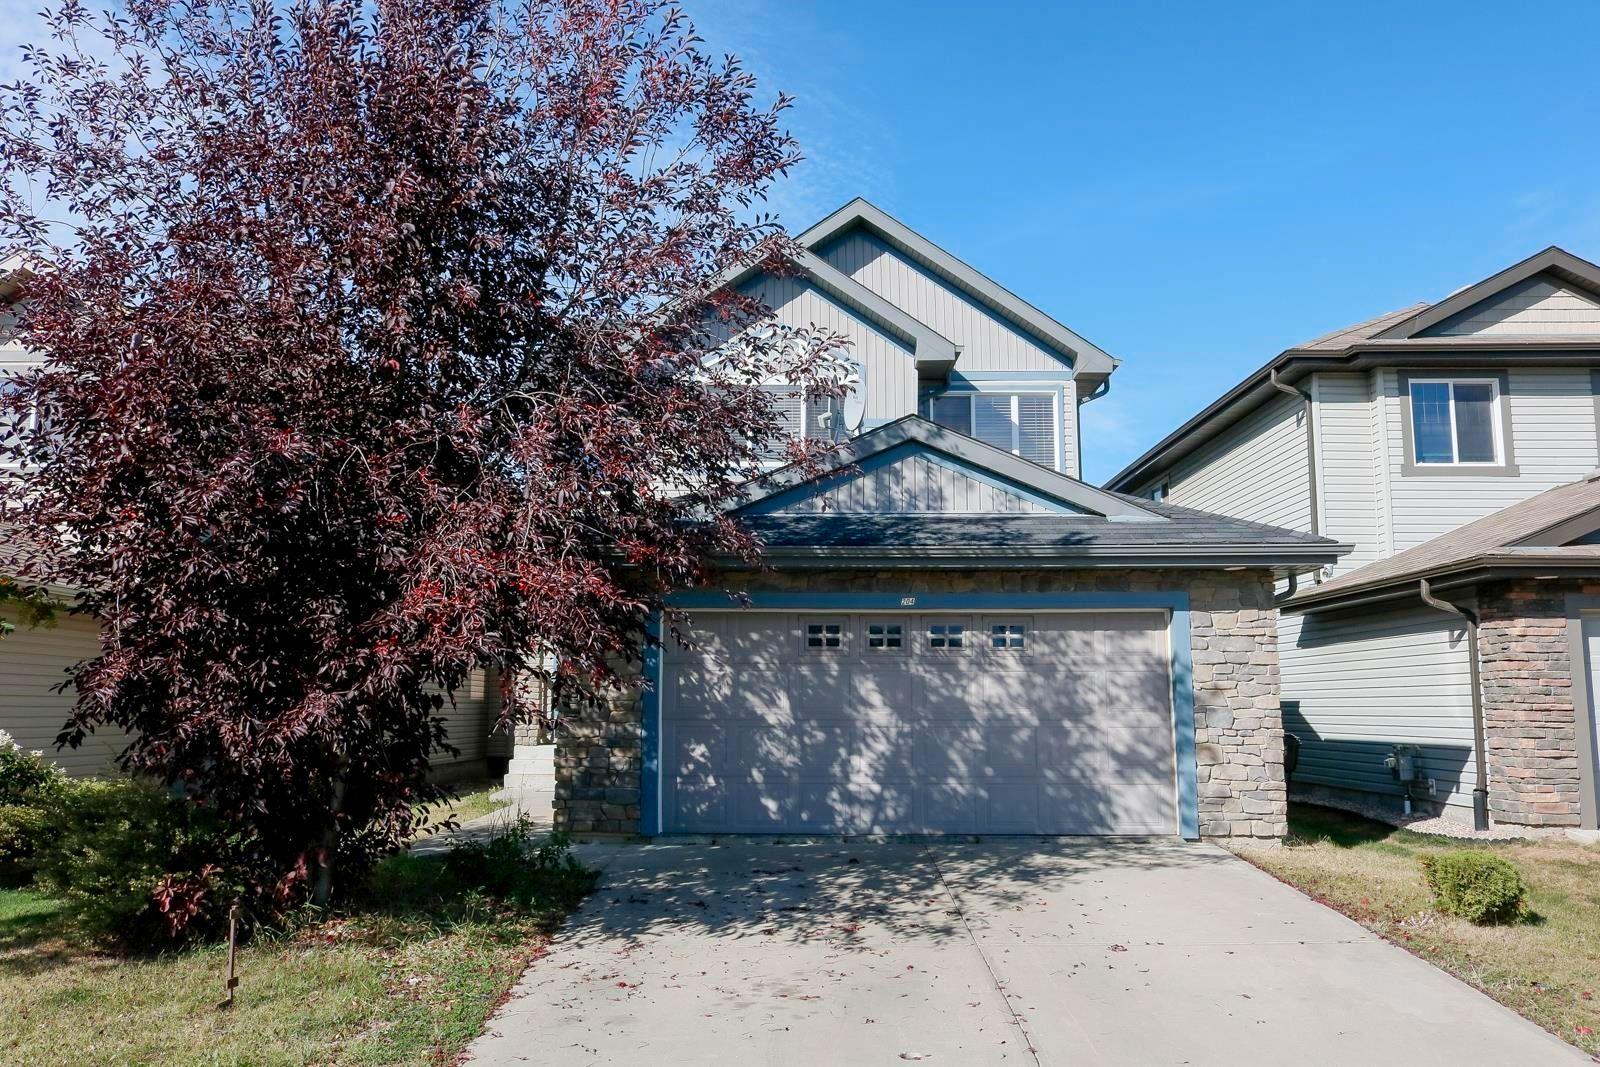 Main Photo: 204 54 Street in Edmonton: Zone 53 House for sale : MLS®# E4262248